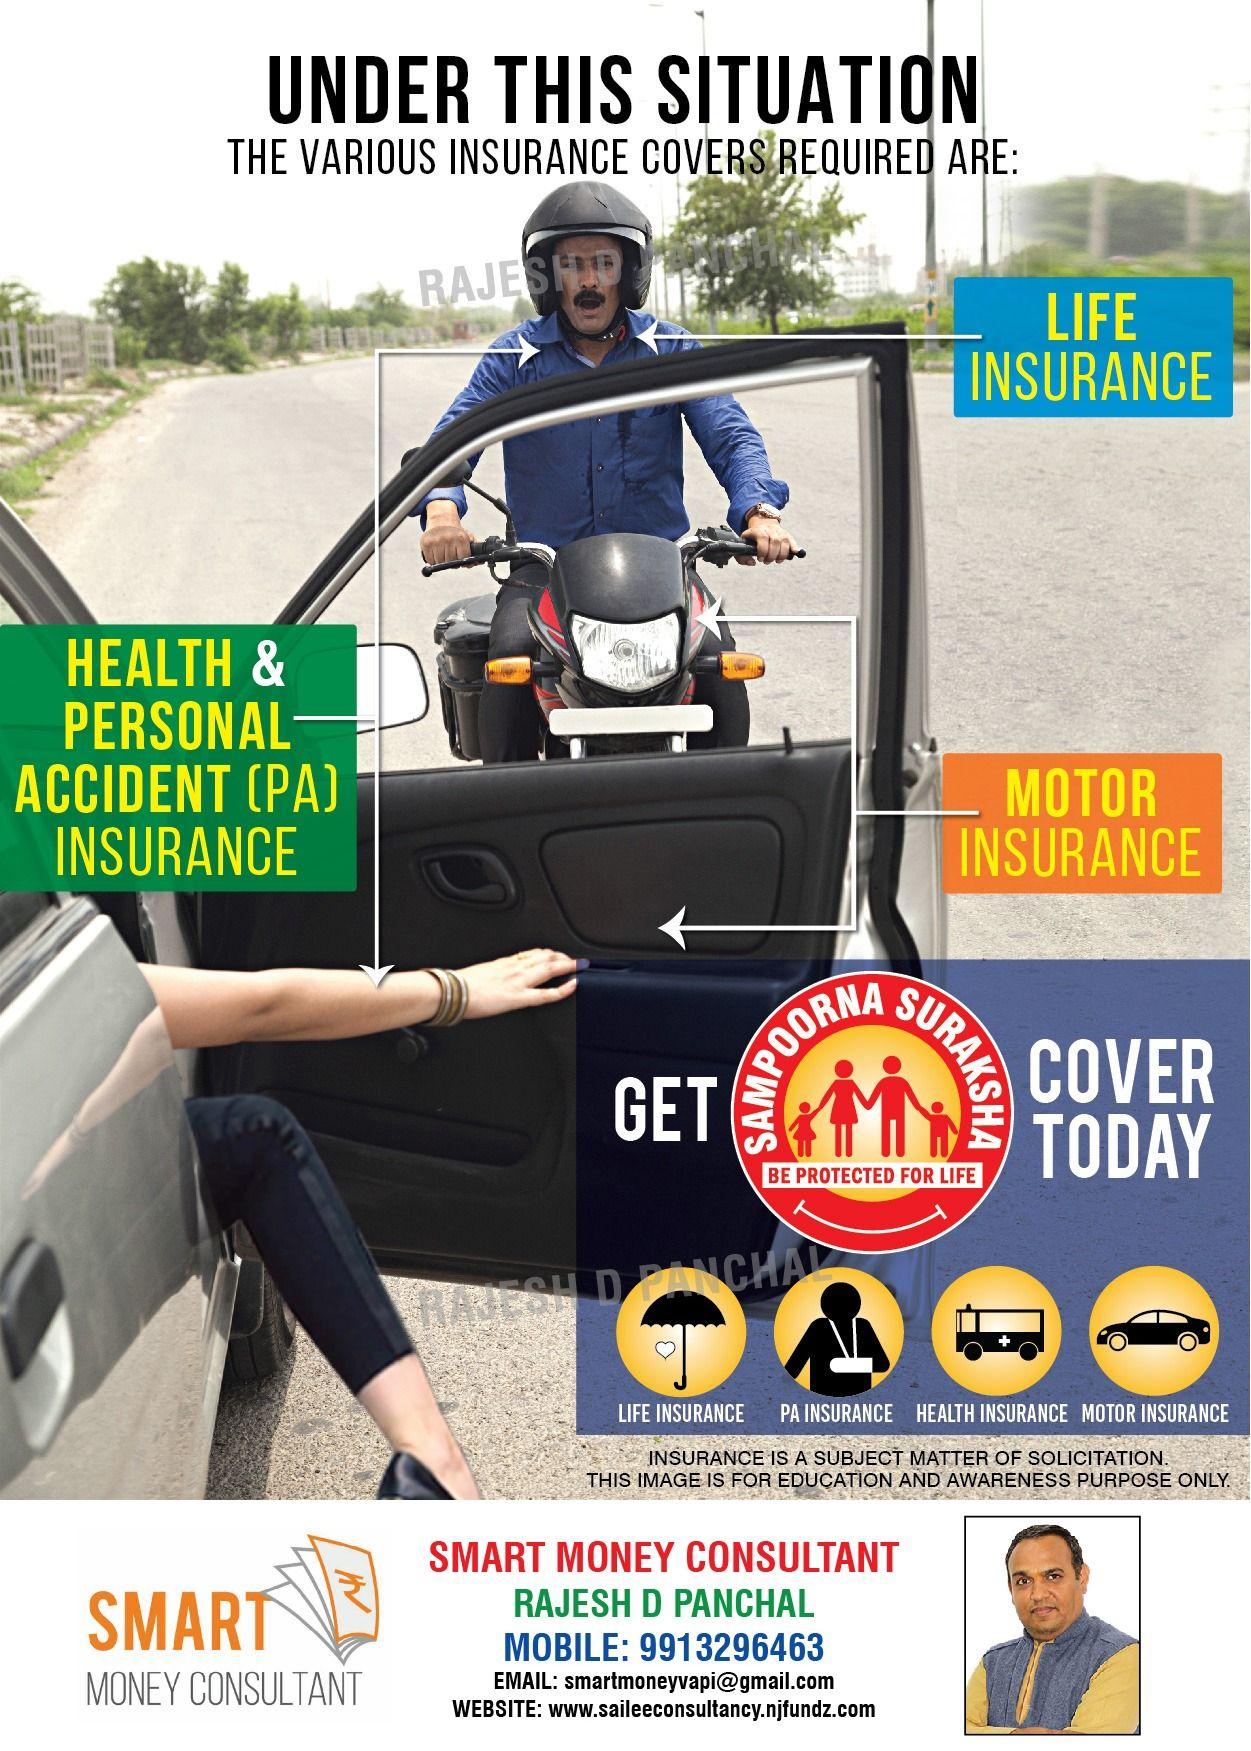 Pin by Harish Meshram on Life insurance | Smart money ...